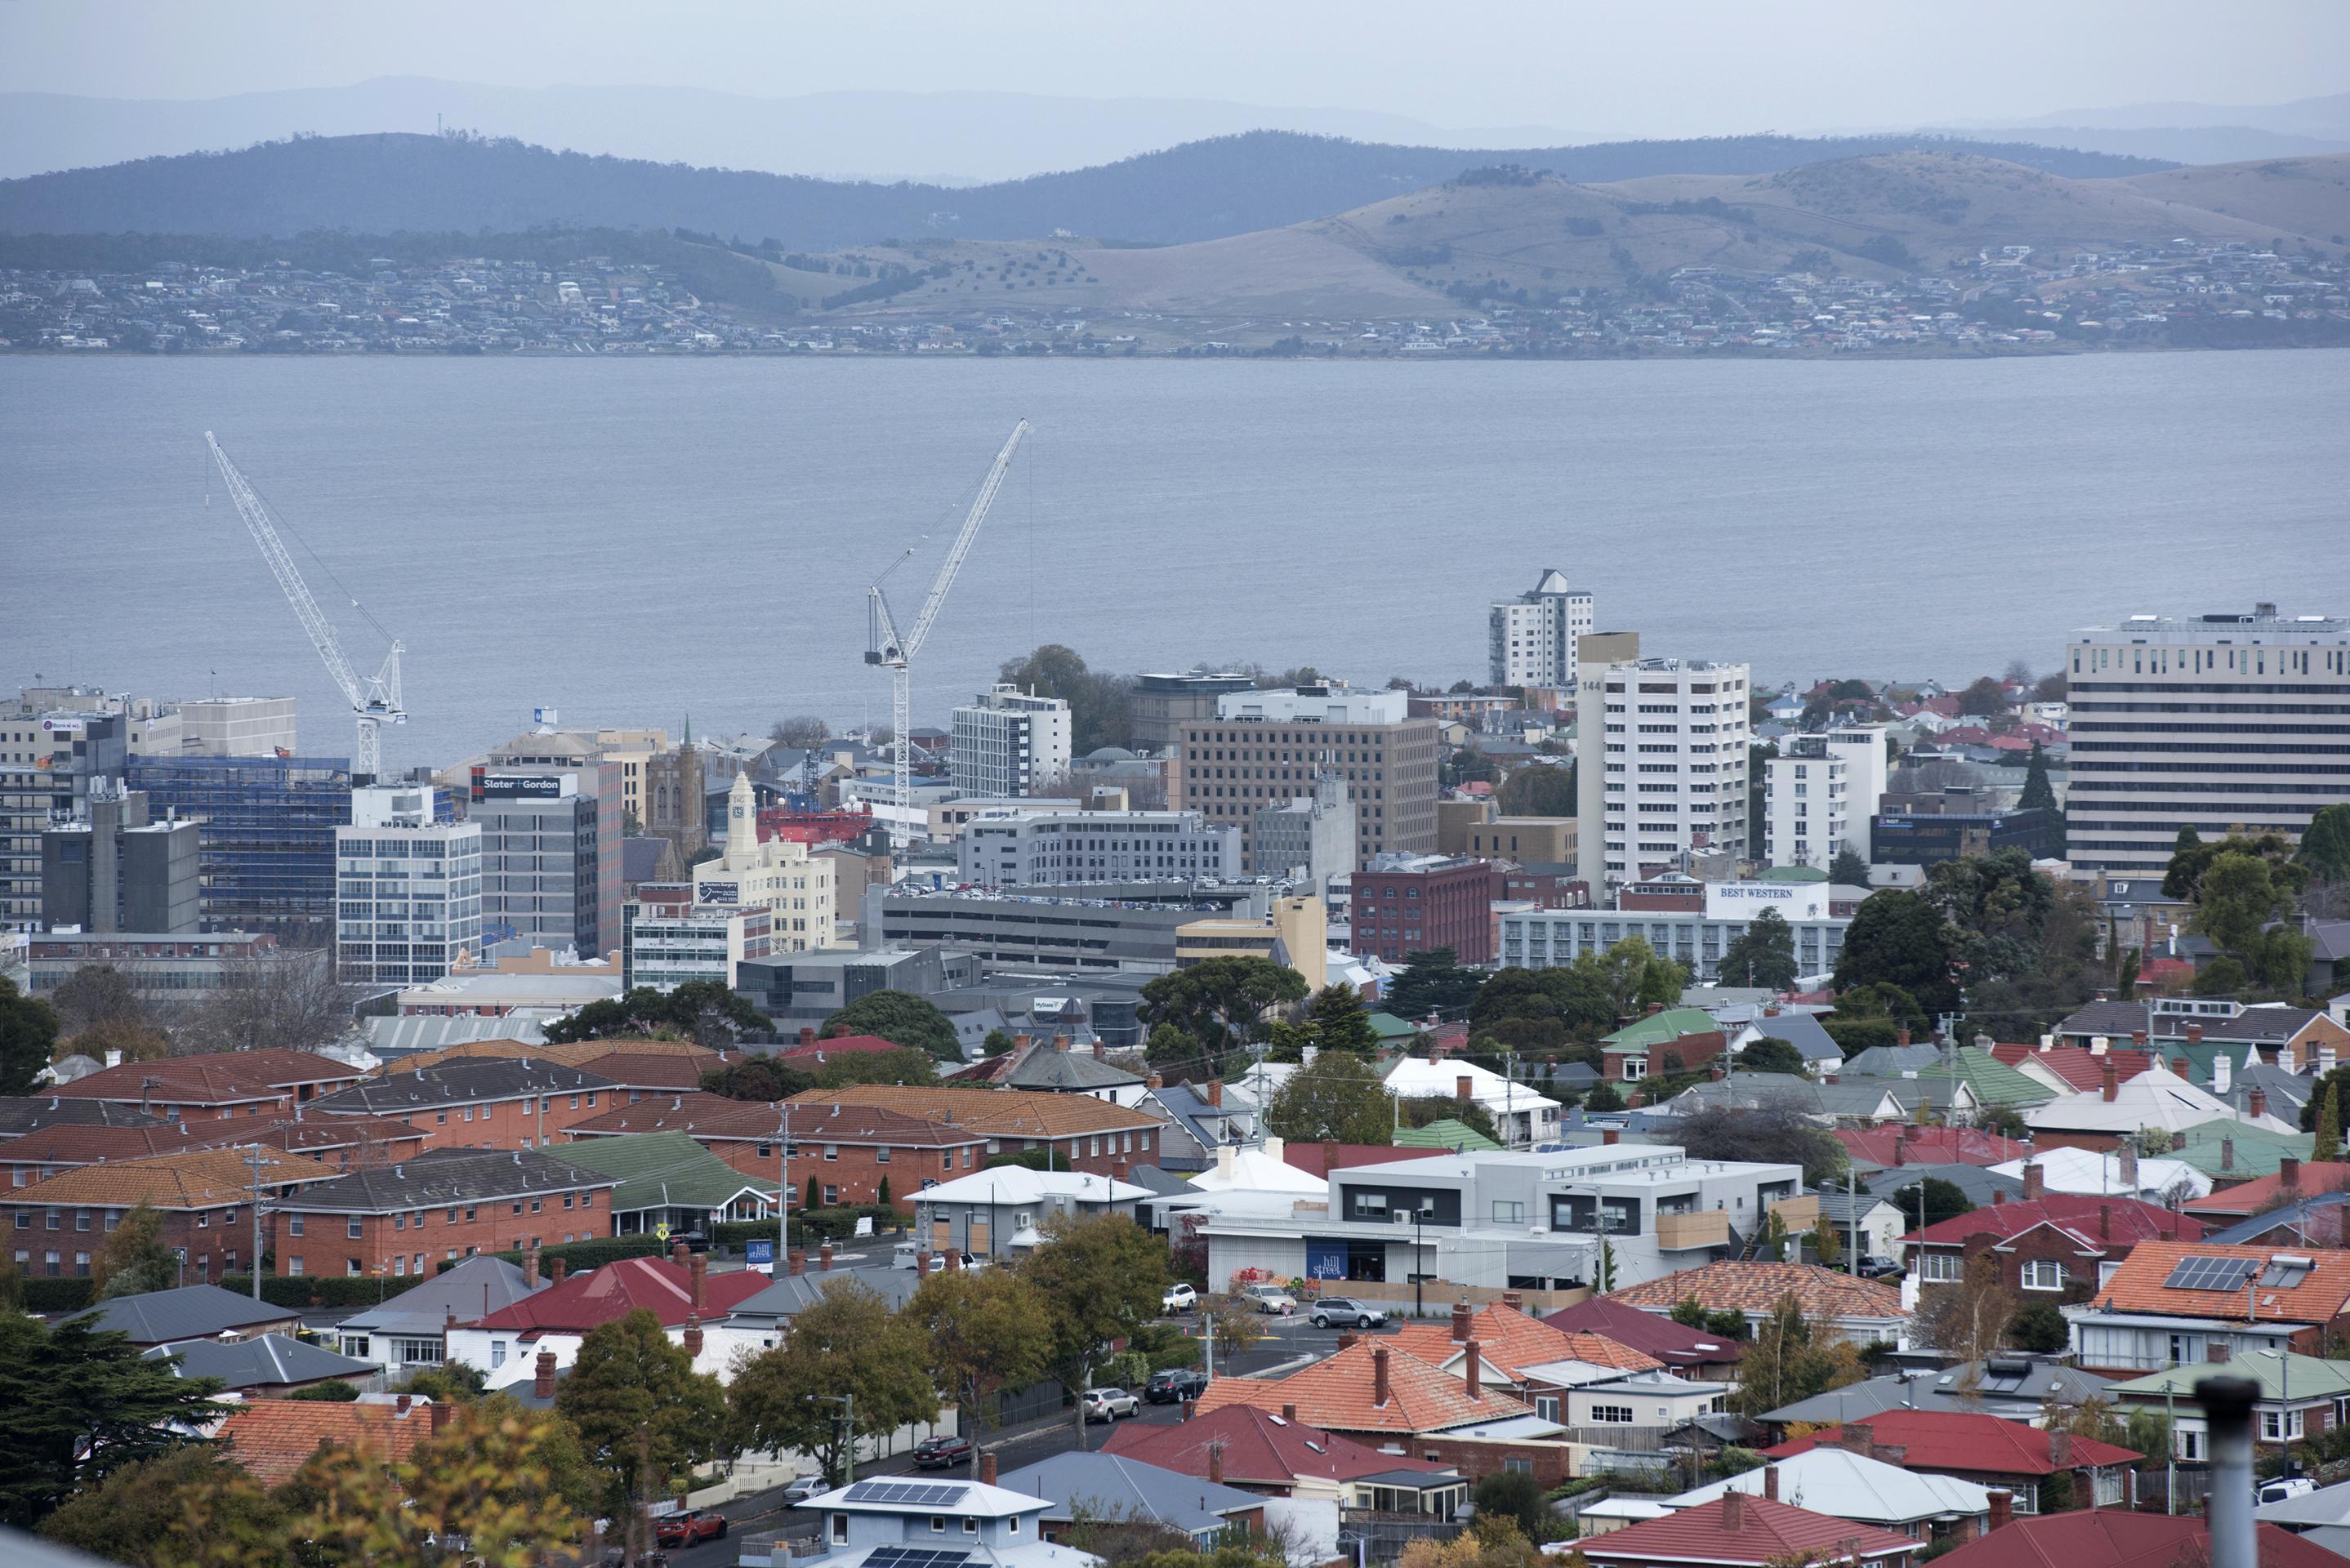 Hobart_Homelessness_206_wcsrn1